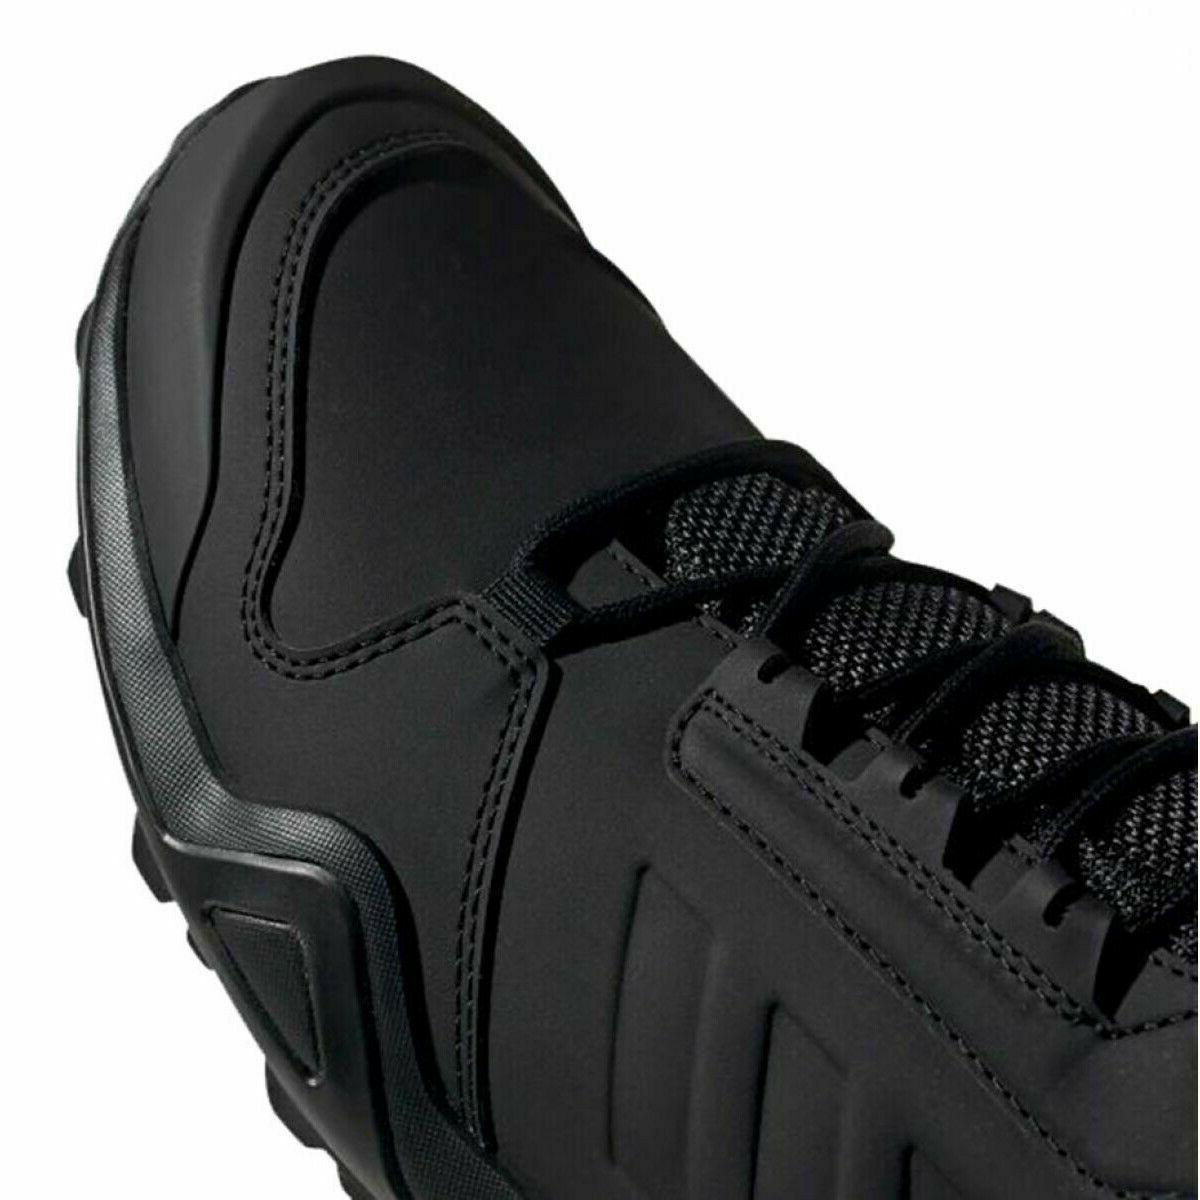 Adidas Men's Terrex Beta Mid Boots